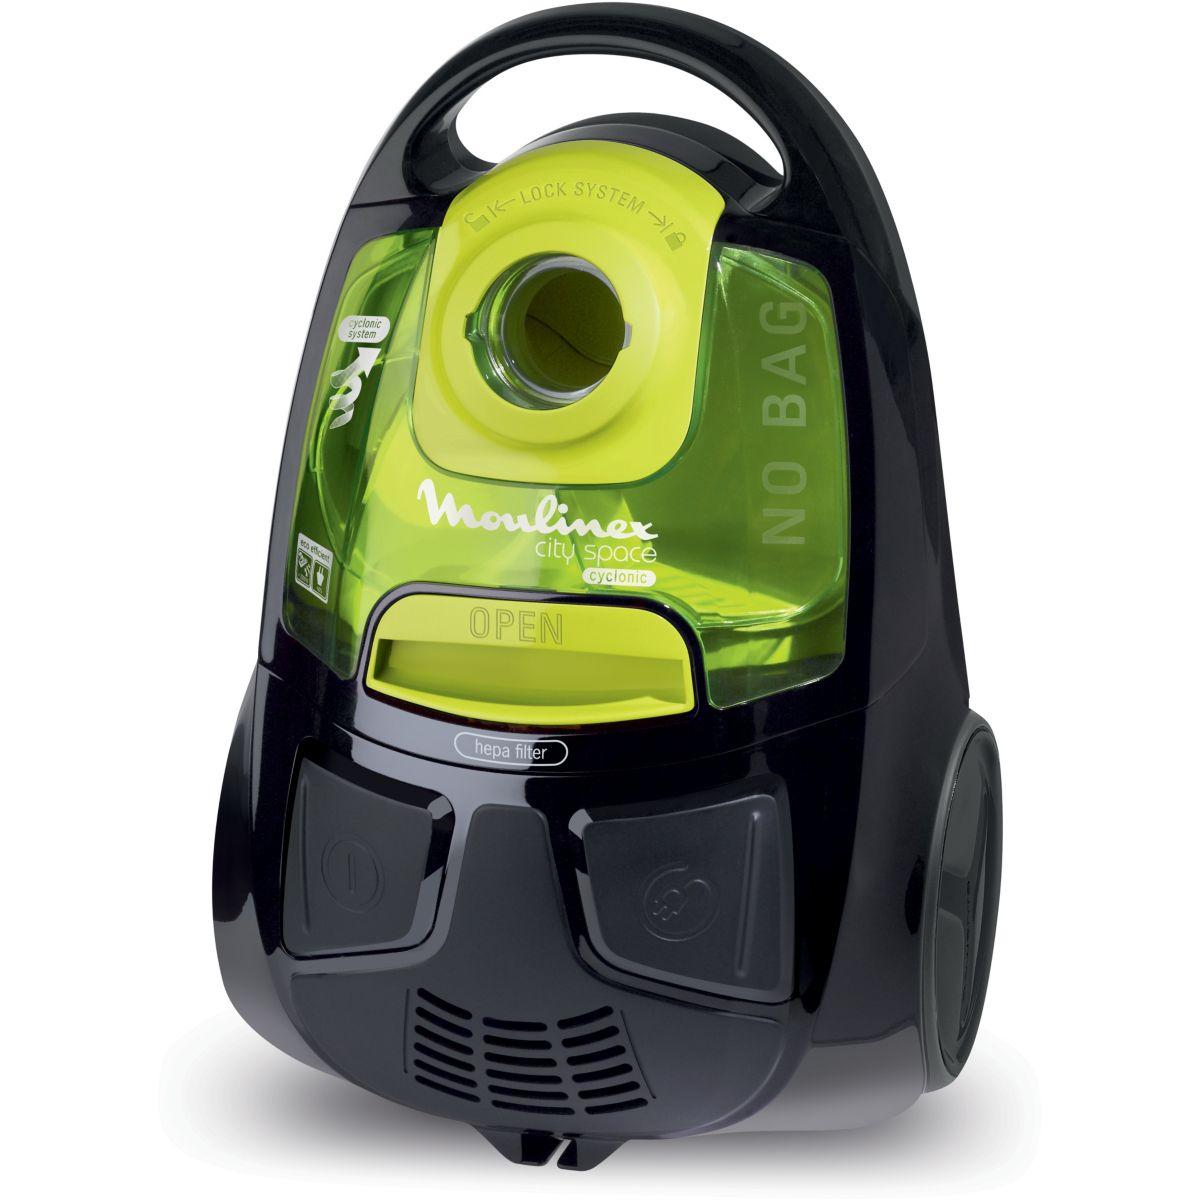 moulinex mo5265pa aspirateur tra neau avec sac compacteo. Black Bedroom Furniture Sets. Home Design Ideas